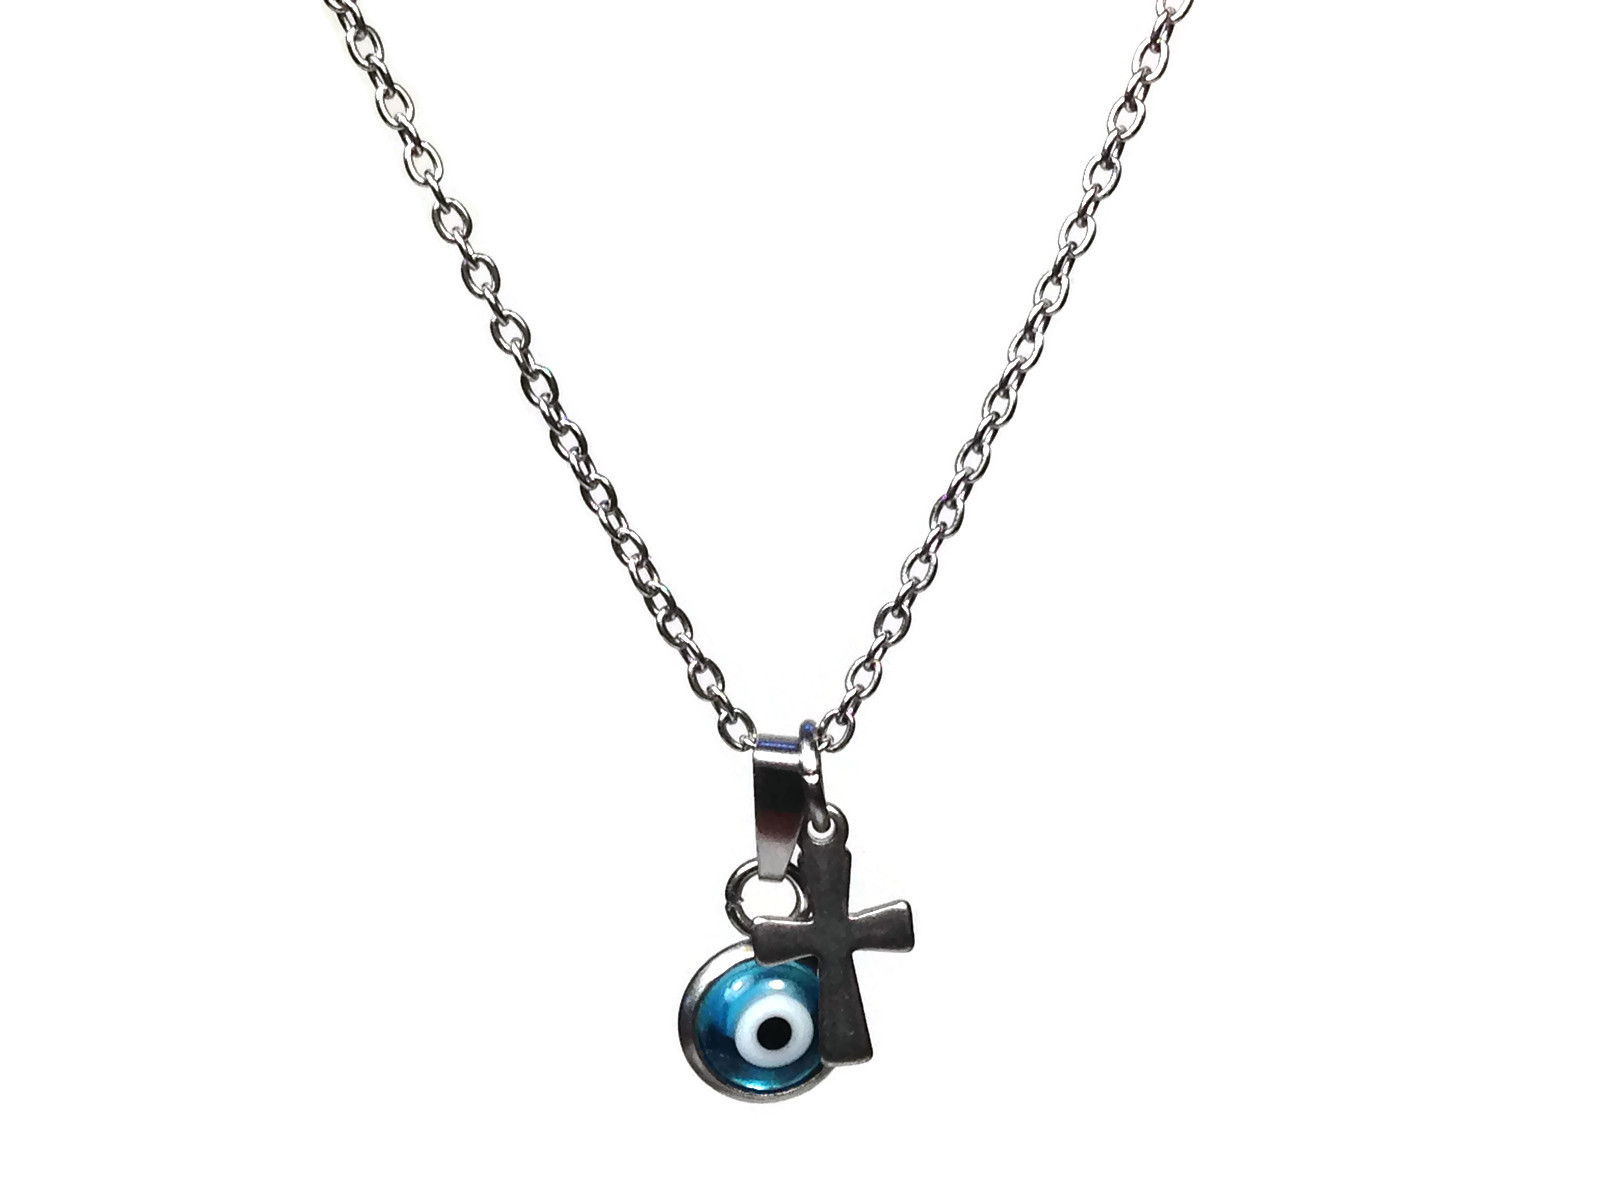 evil eye cross necklace in stainless steel